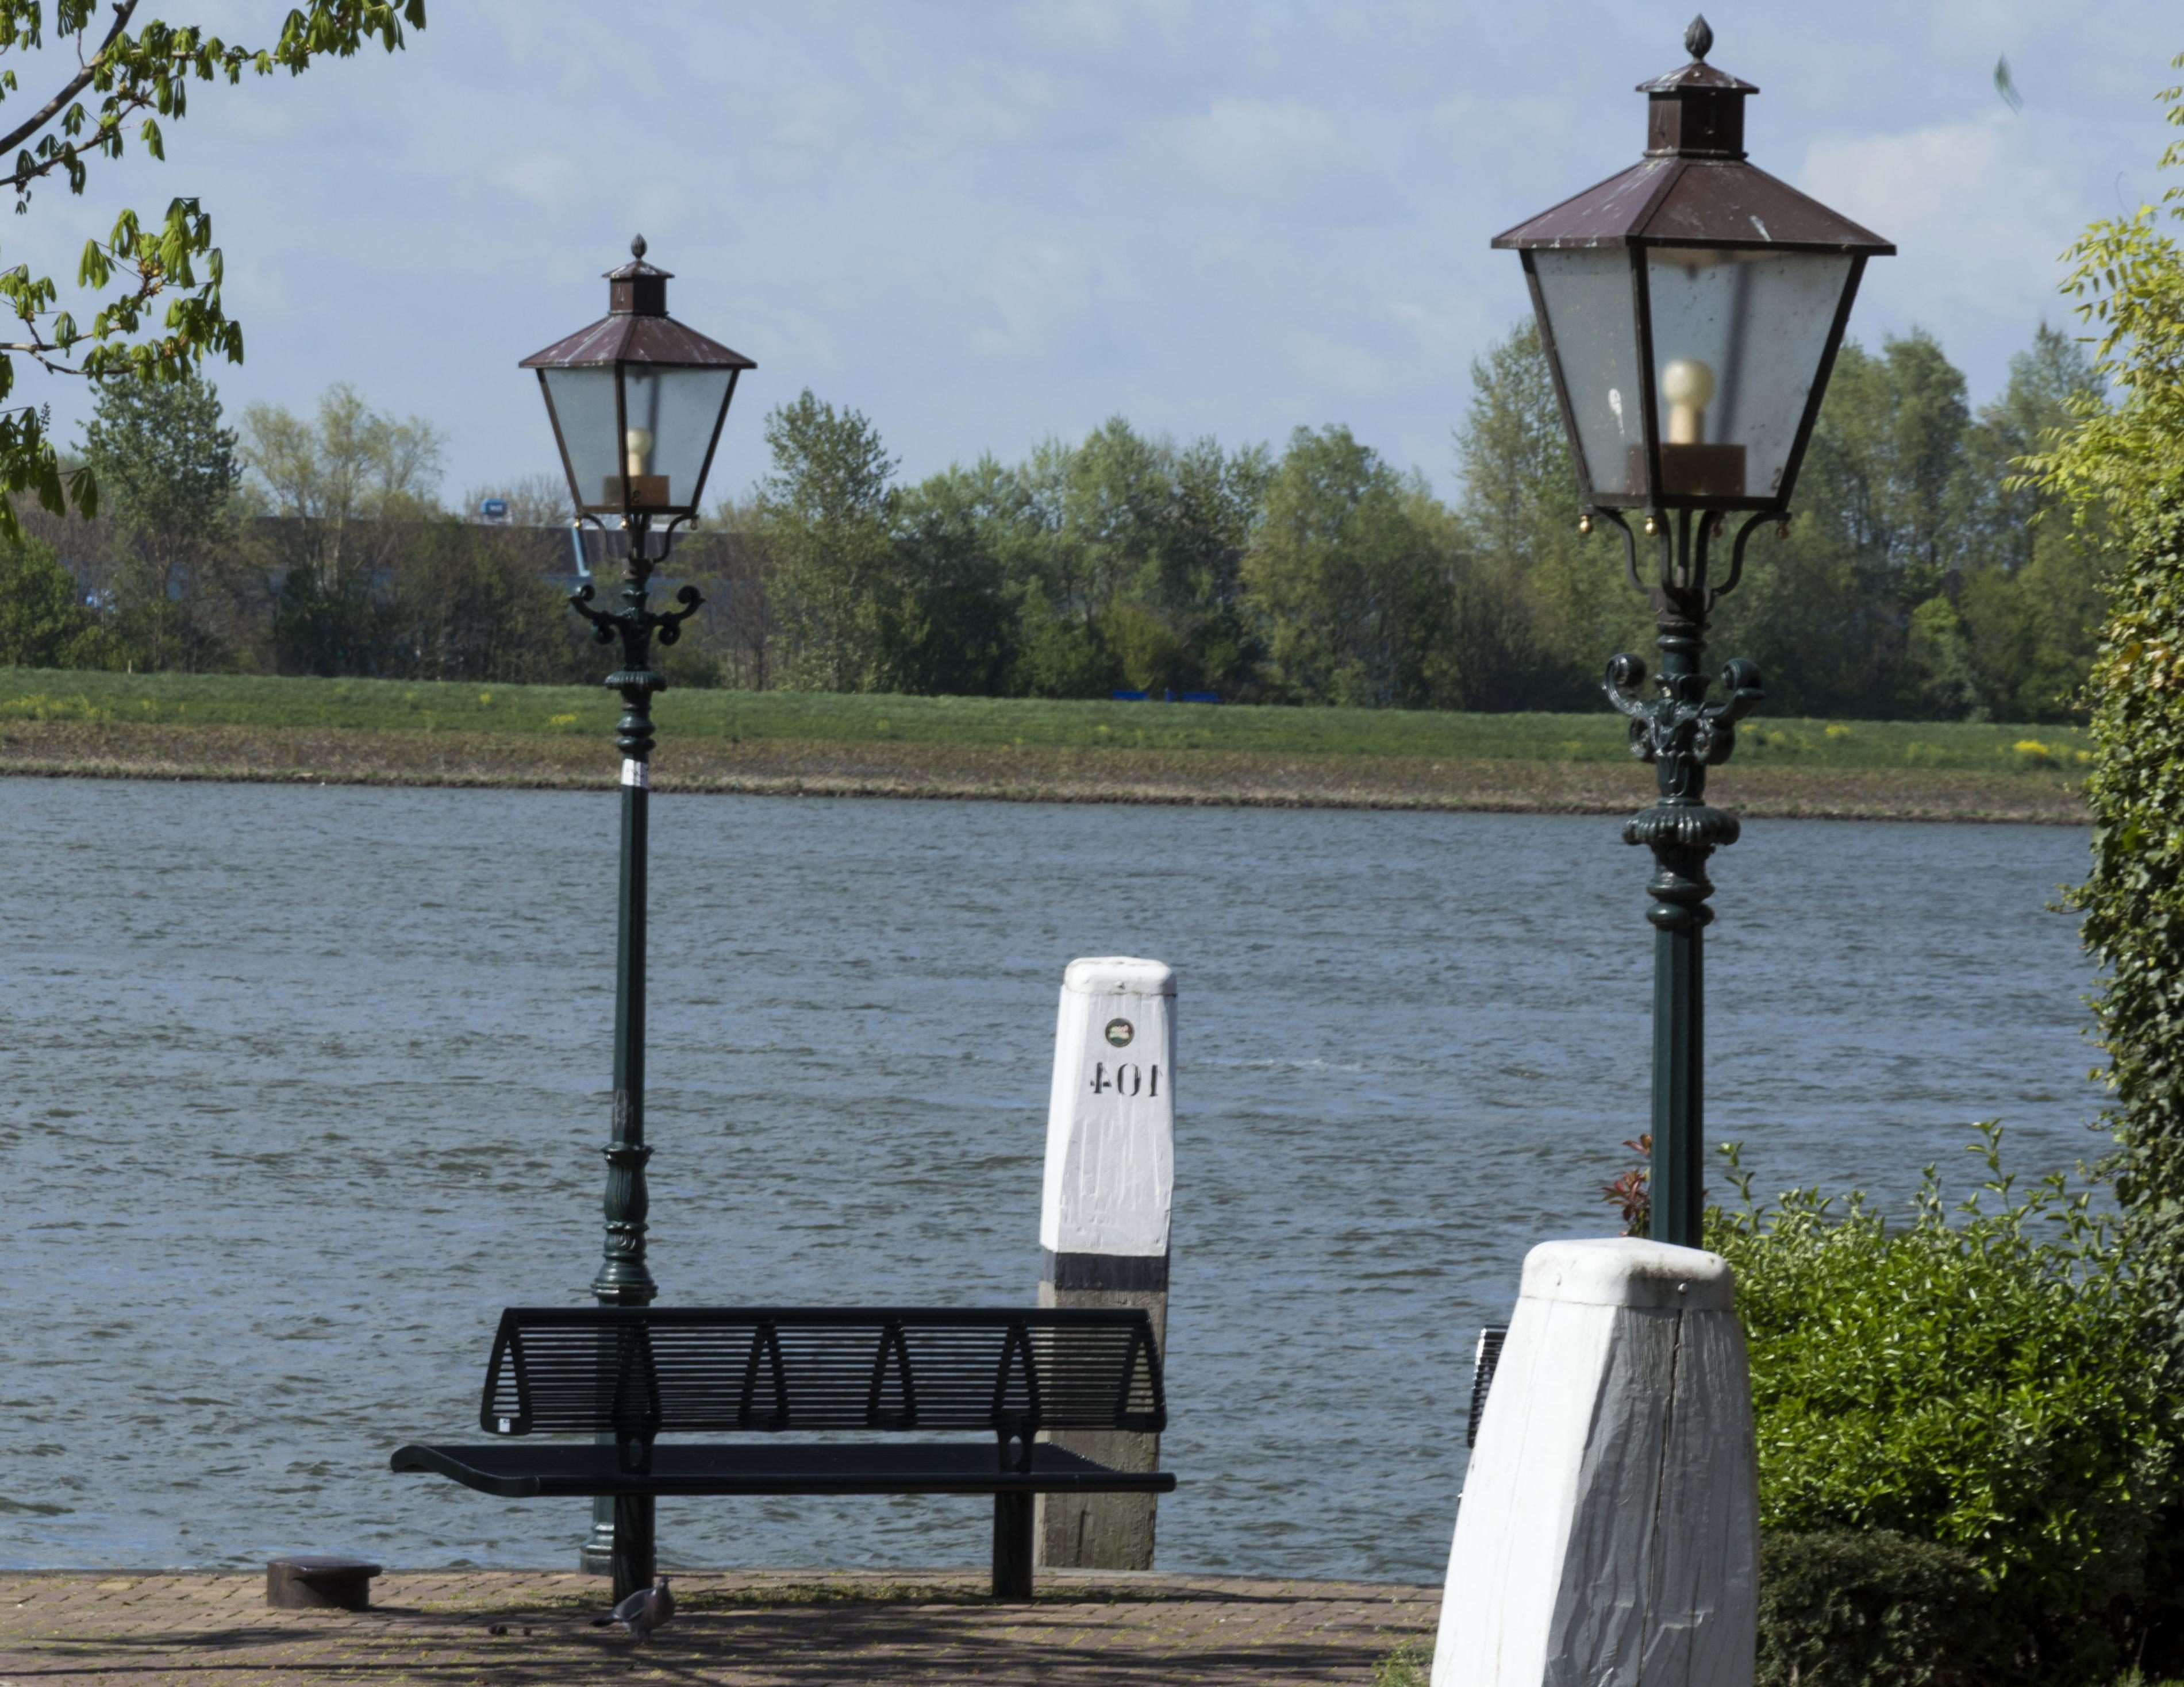 Free picture street lamp park bench lantern water